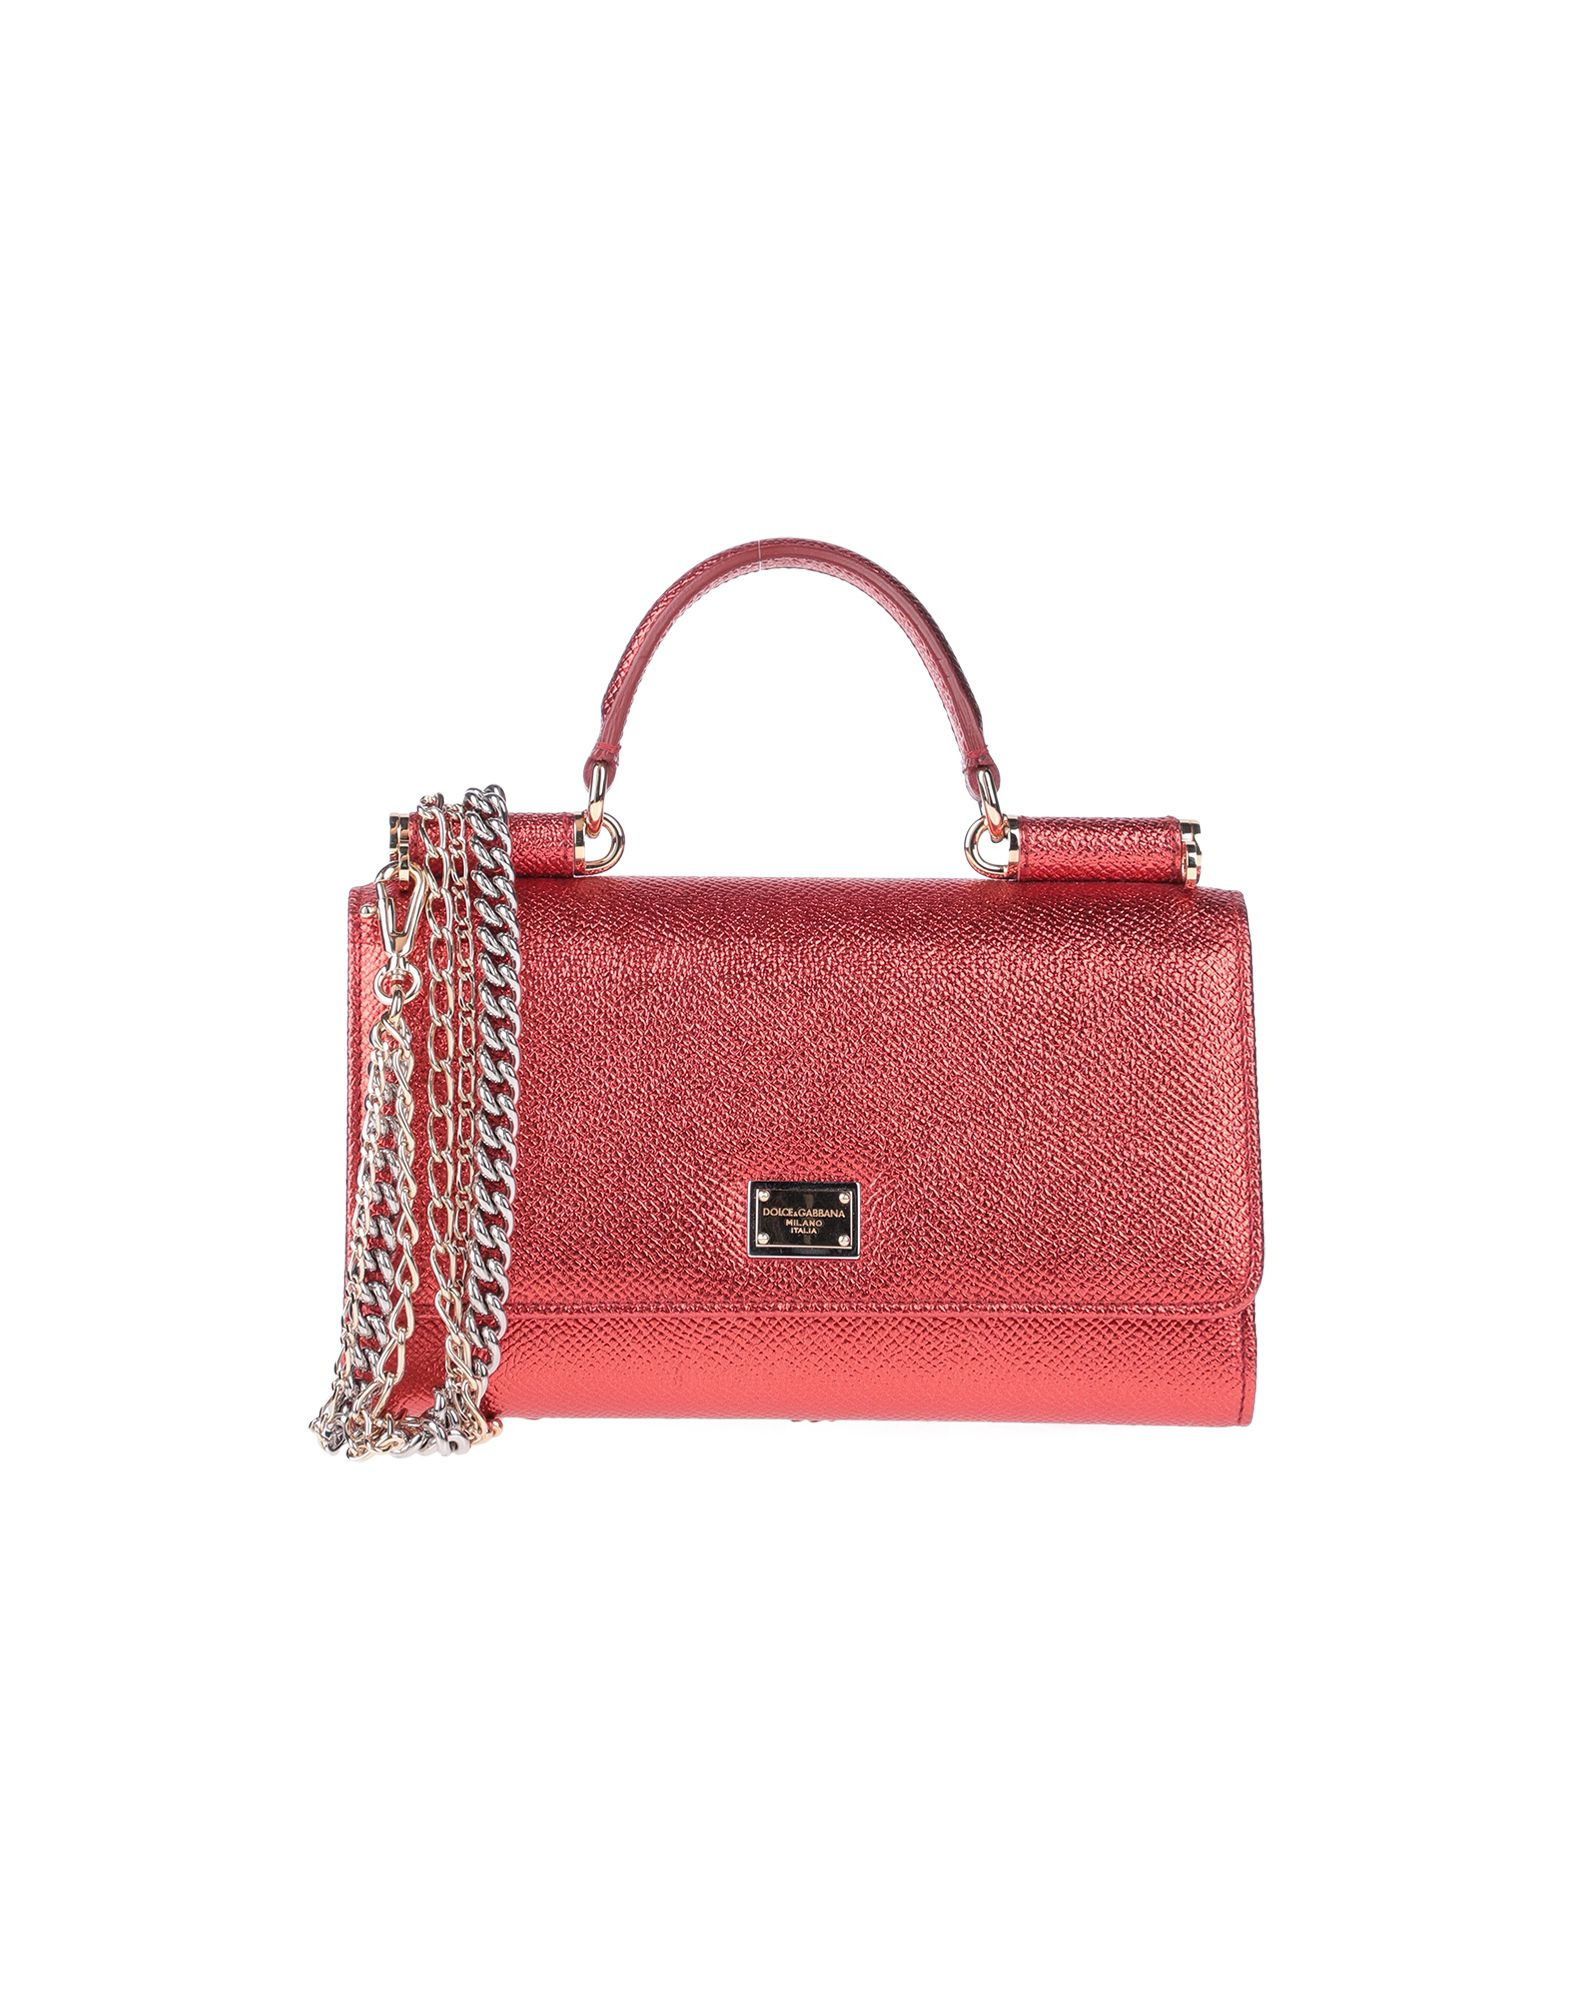 DOLCE & GABBANA Handbags - Item 45348307